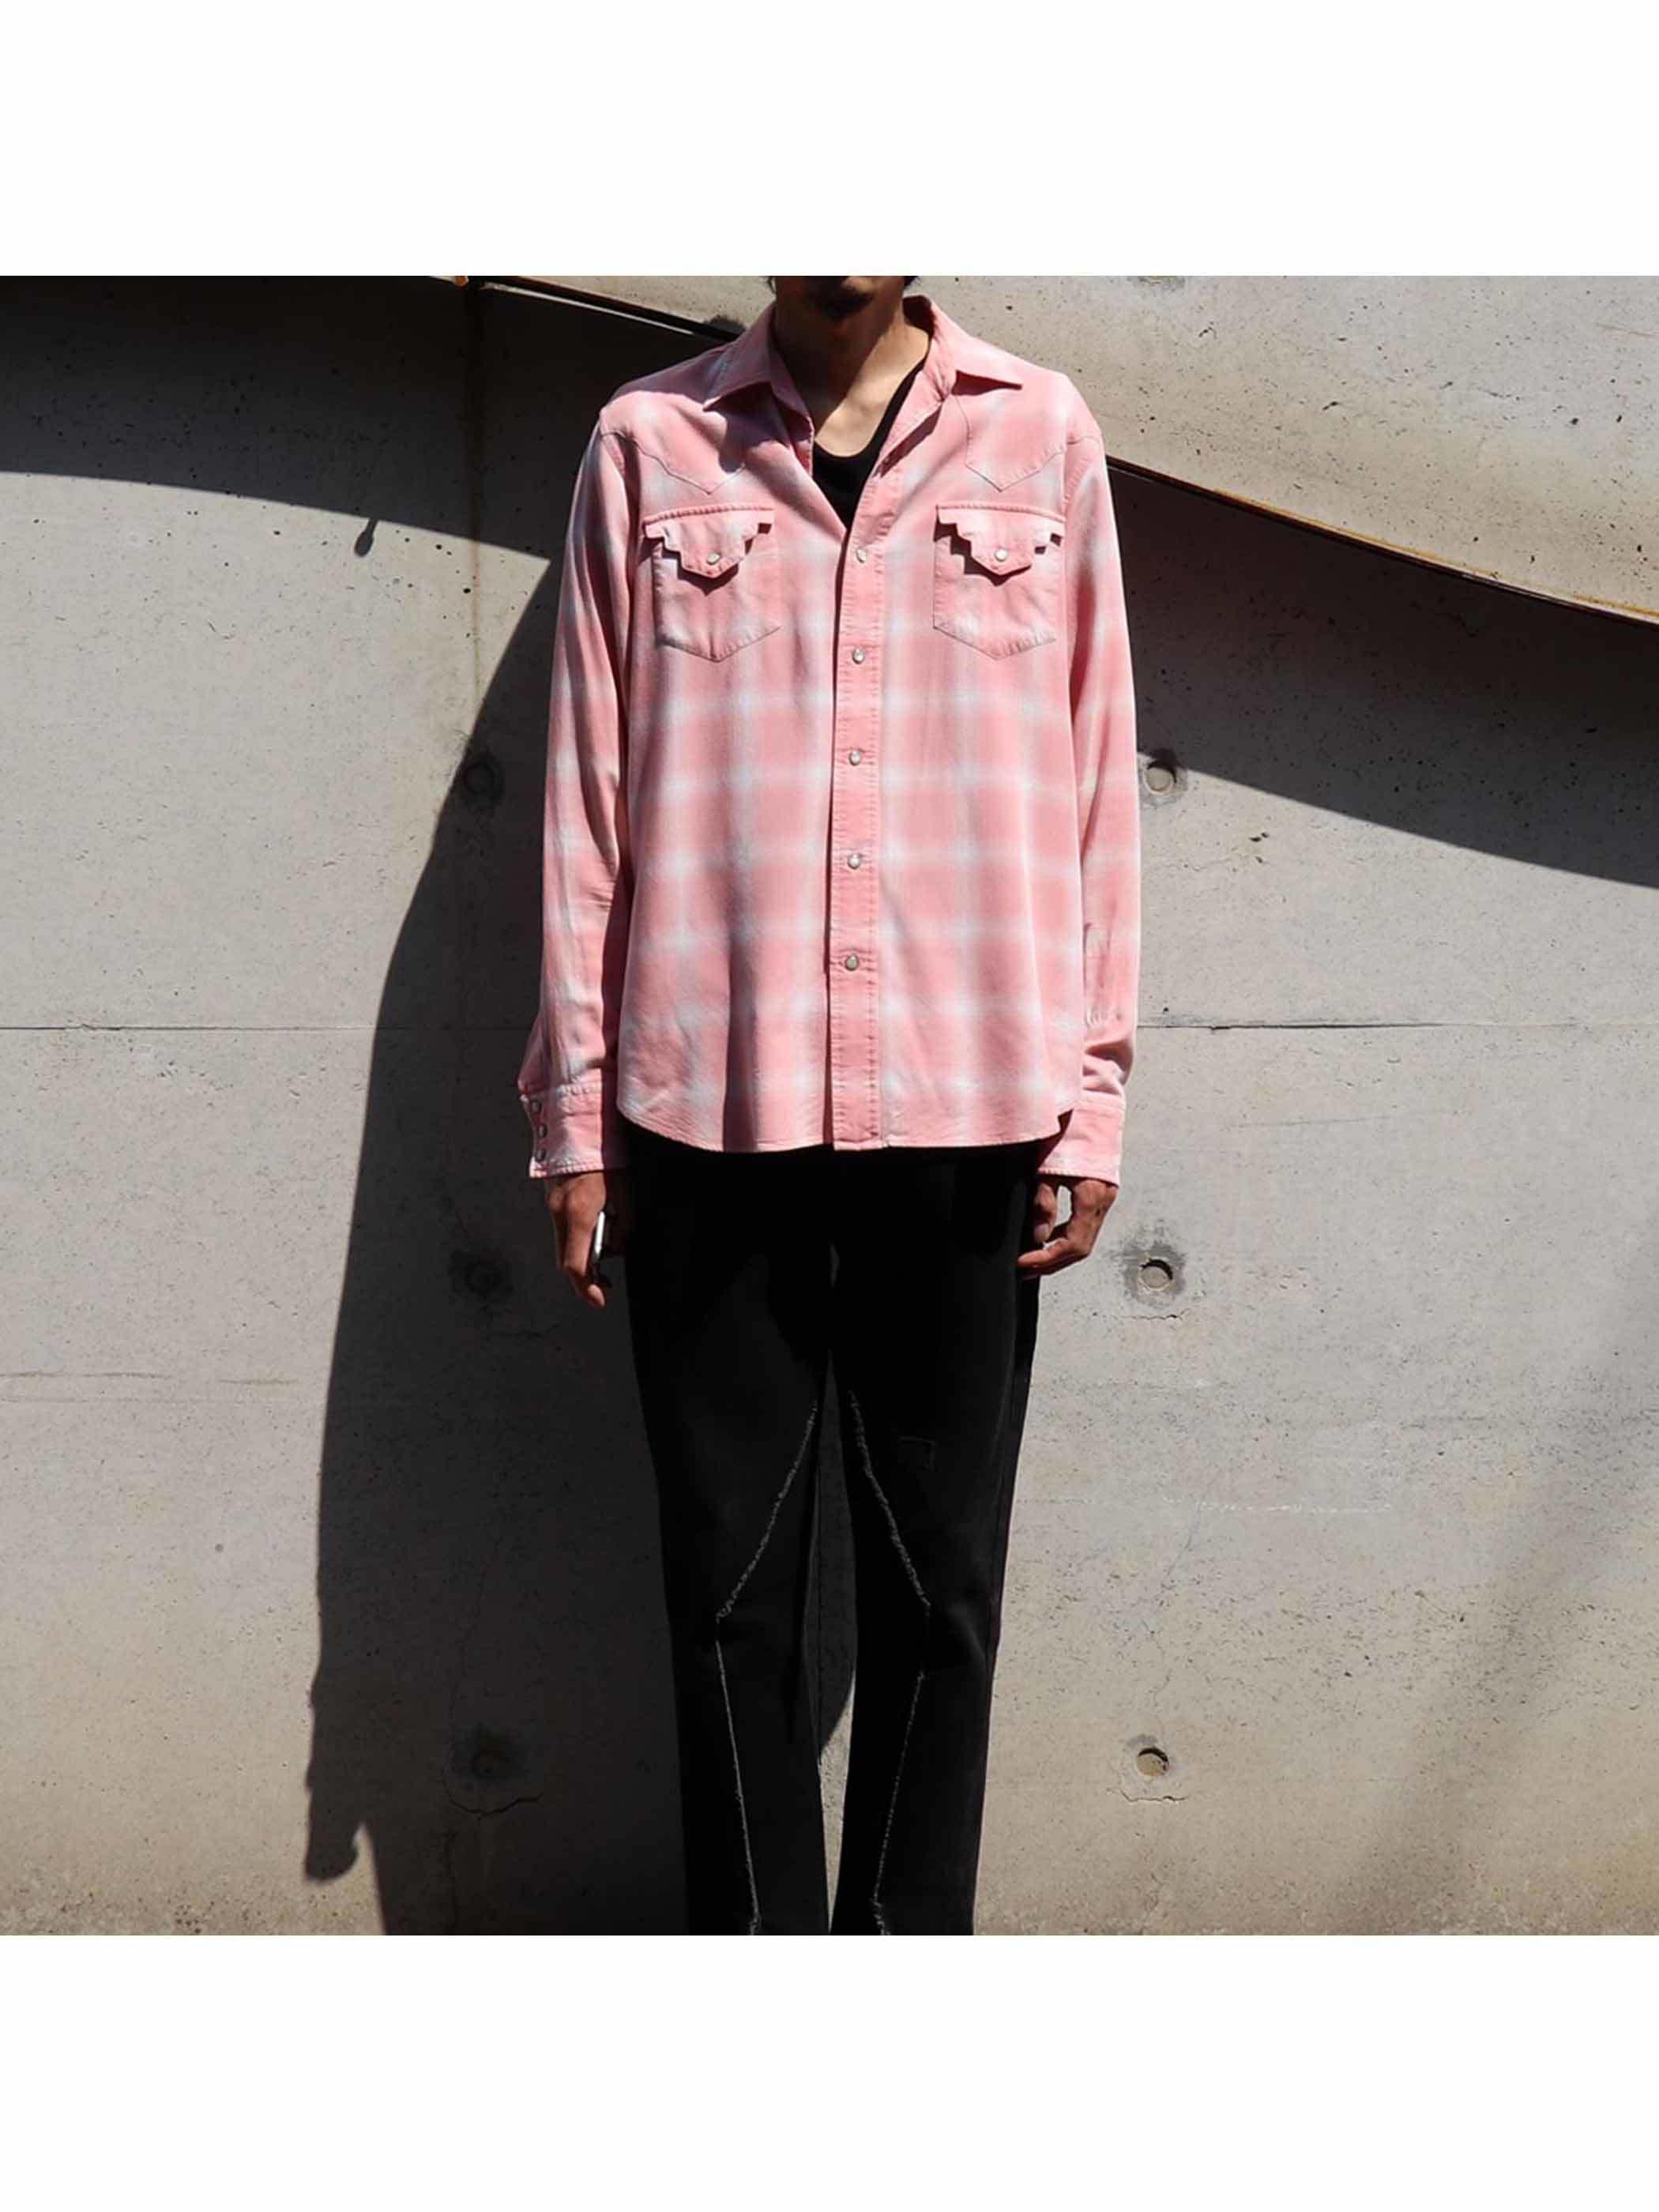 00's POLO RALPH LAUREN Pink×White Woven Shadow Plaid Western Shirt [M]